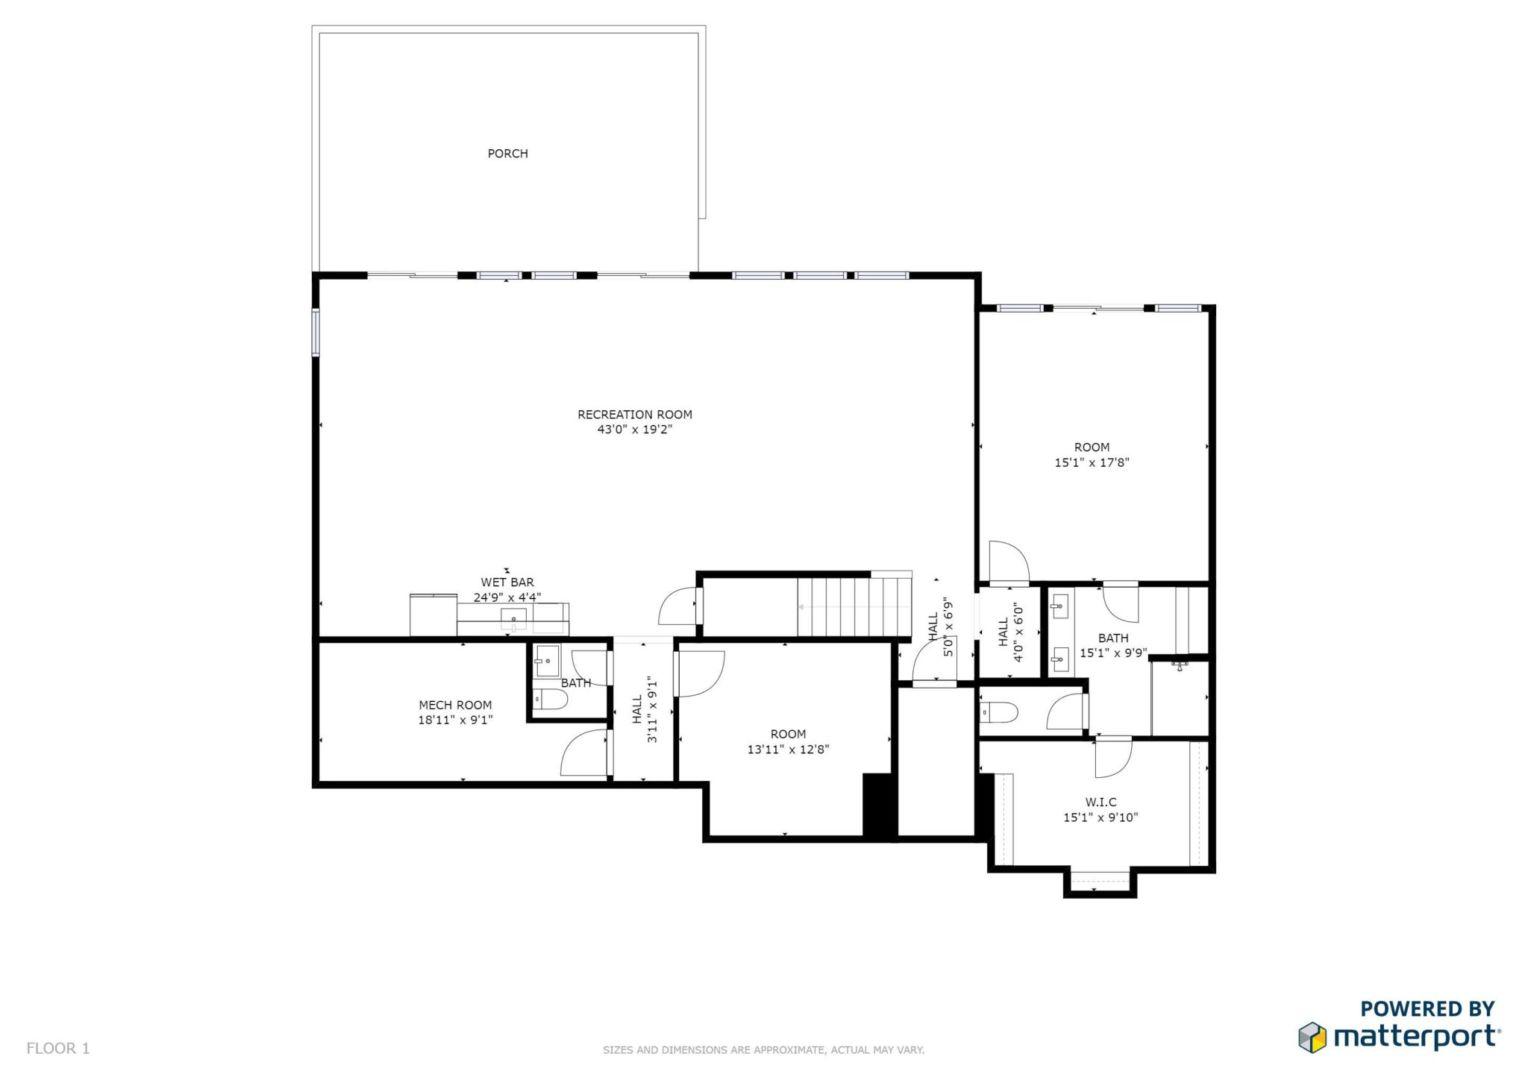 259 Waterview Floor Plan_Page_1